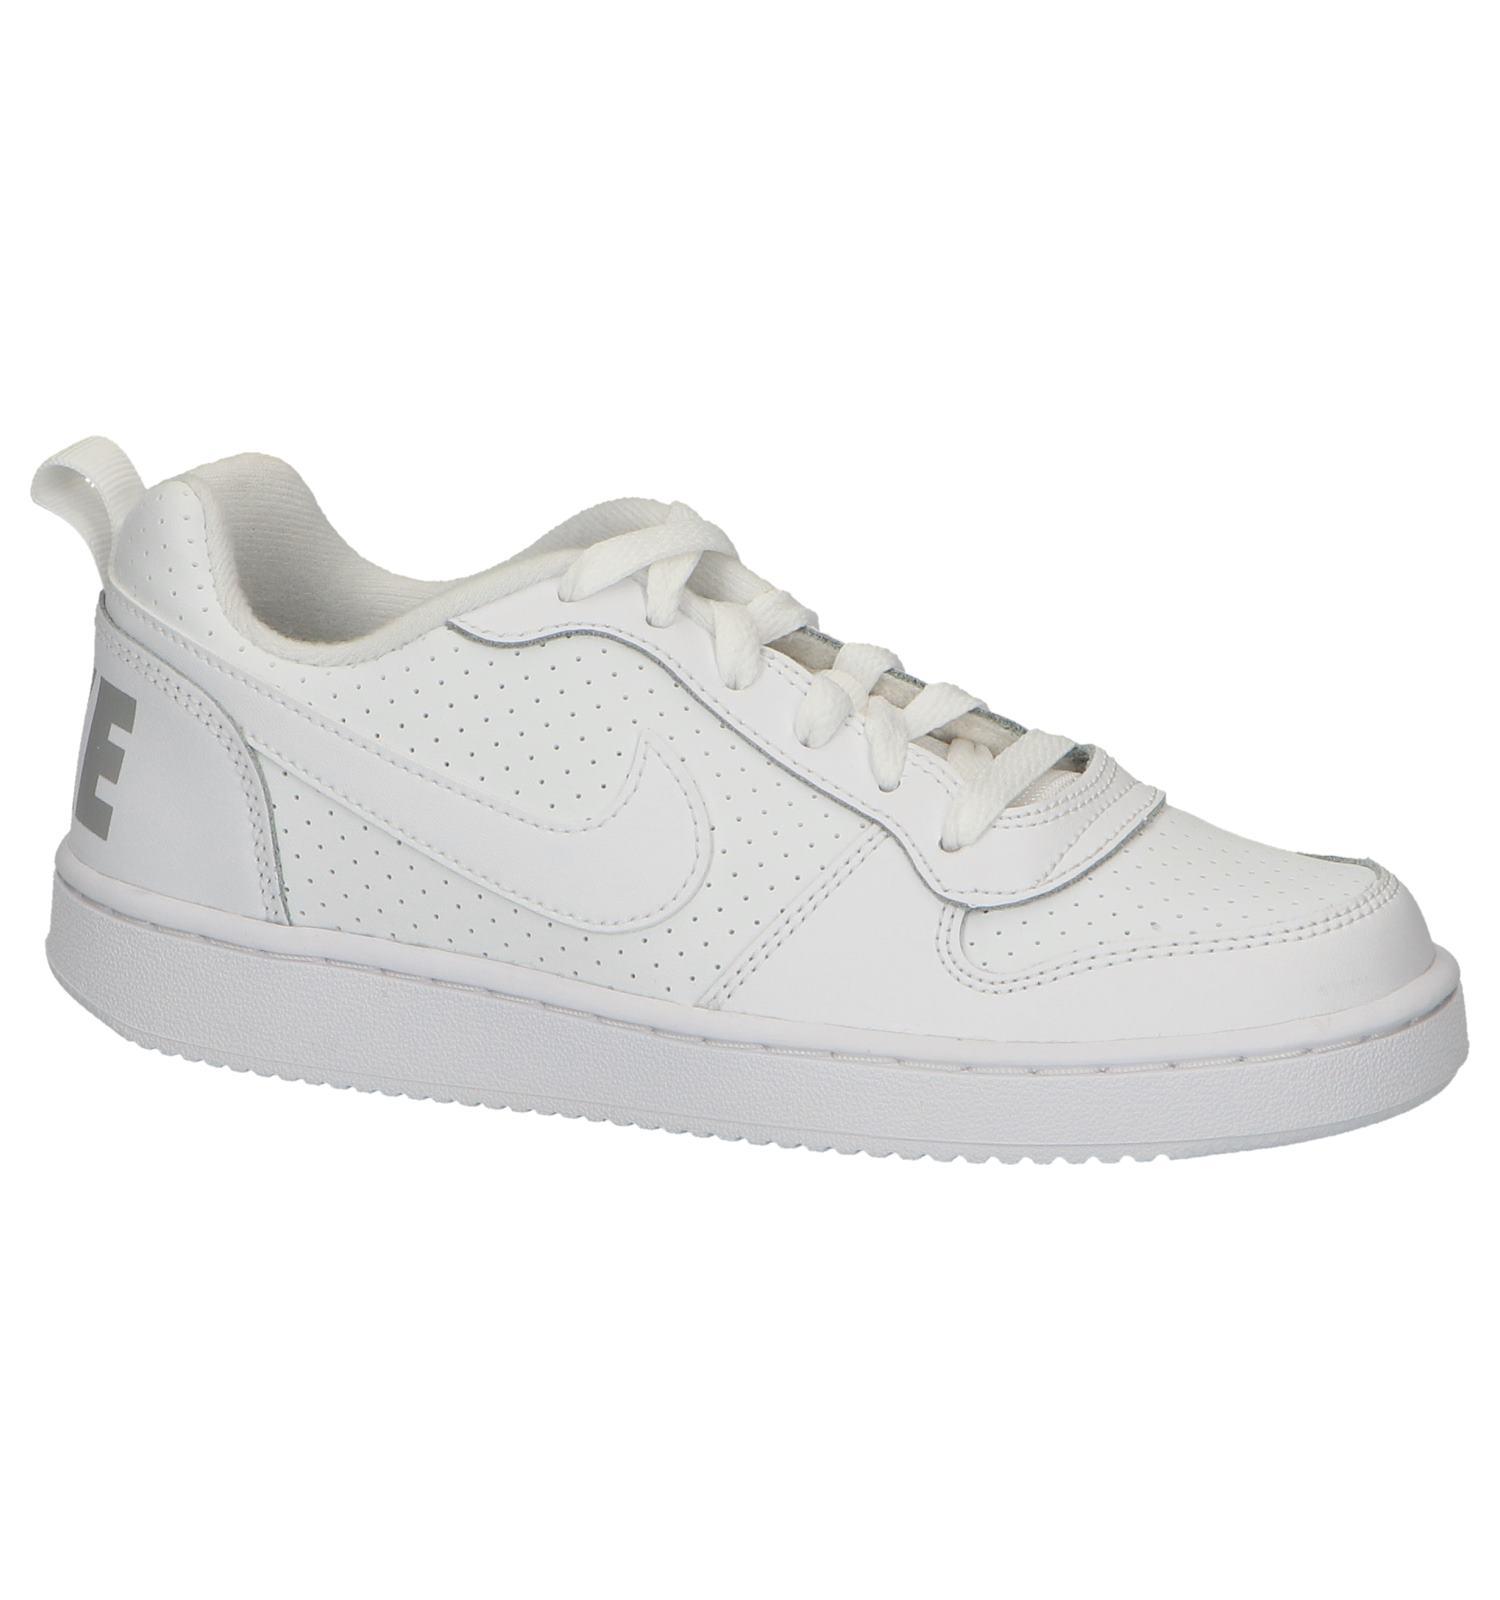 be3241cb5e2 Witte Sneakers Nike Court Borough Low | TORFS.BE | Gratis verzend en retour